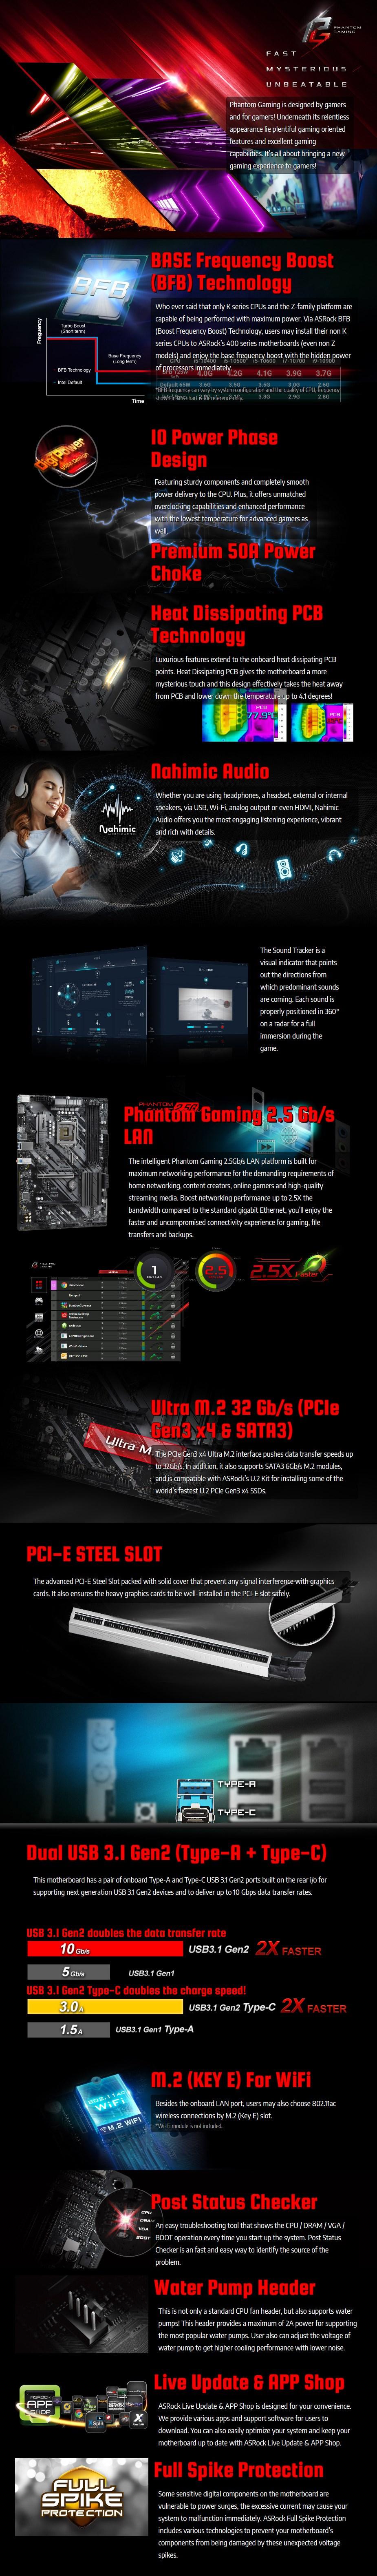 ASRock Z490 Phantom Gaming 4/2.5G LGA 1200 ATX Motherboard - Overview 1